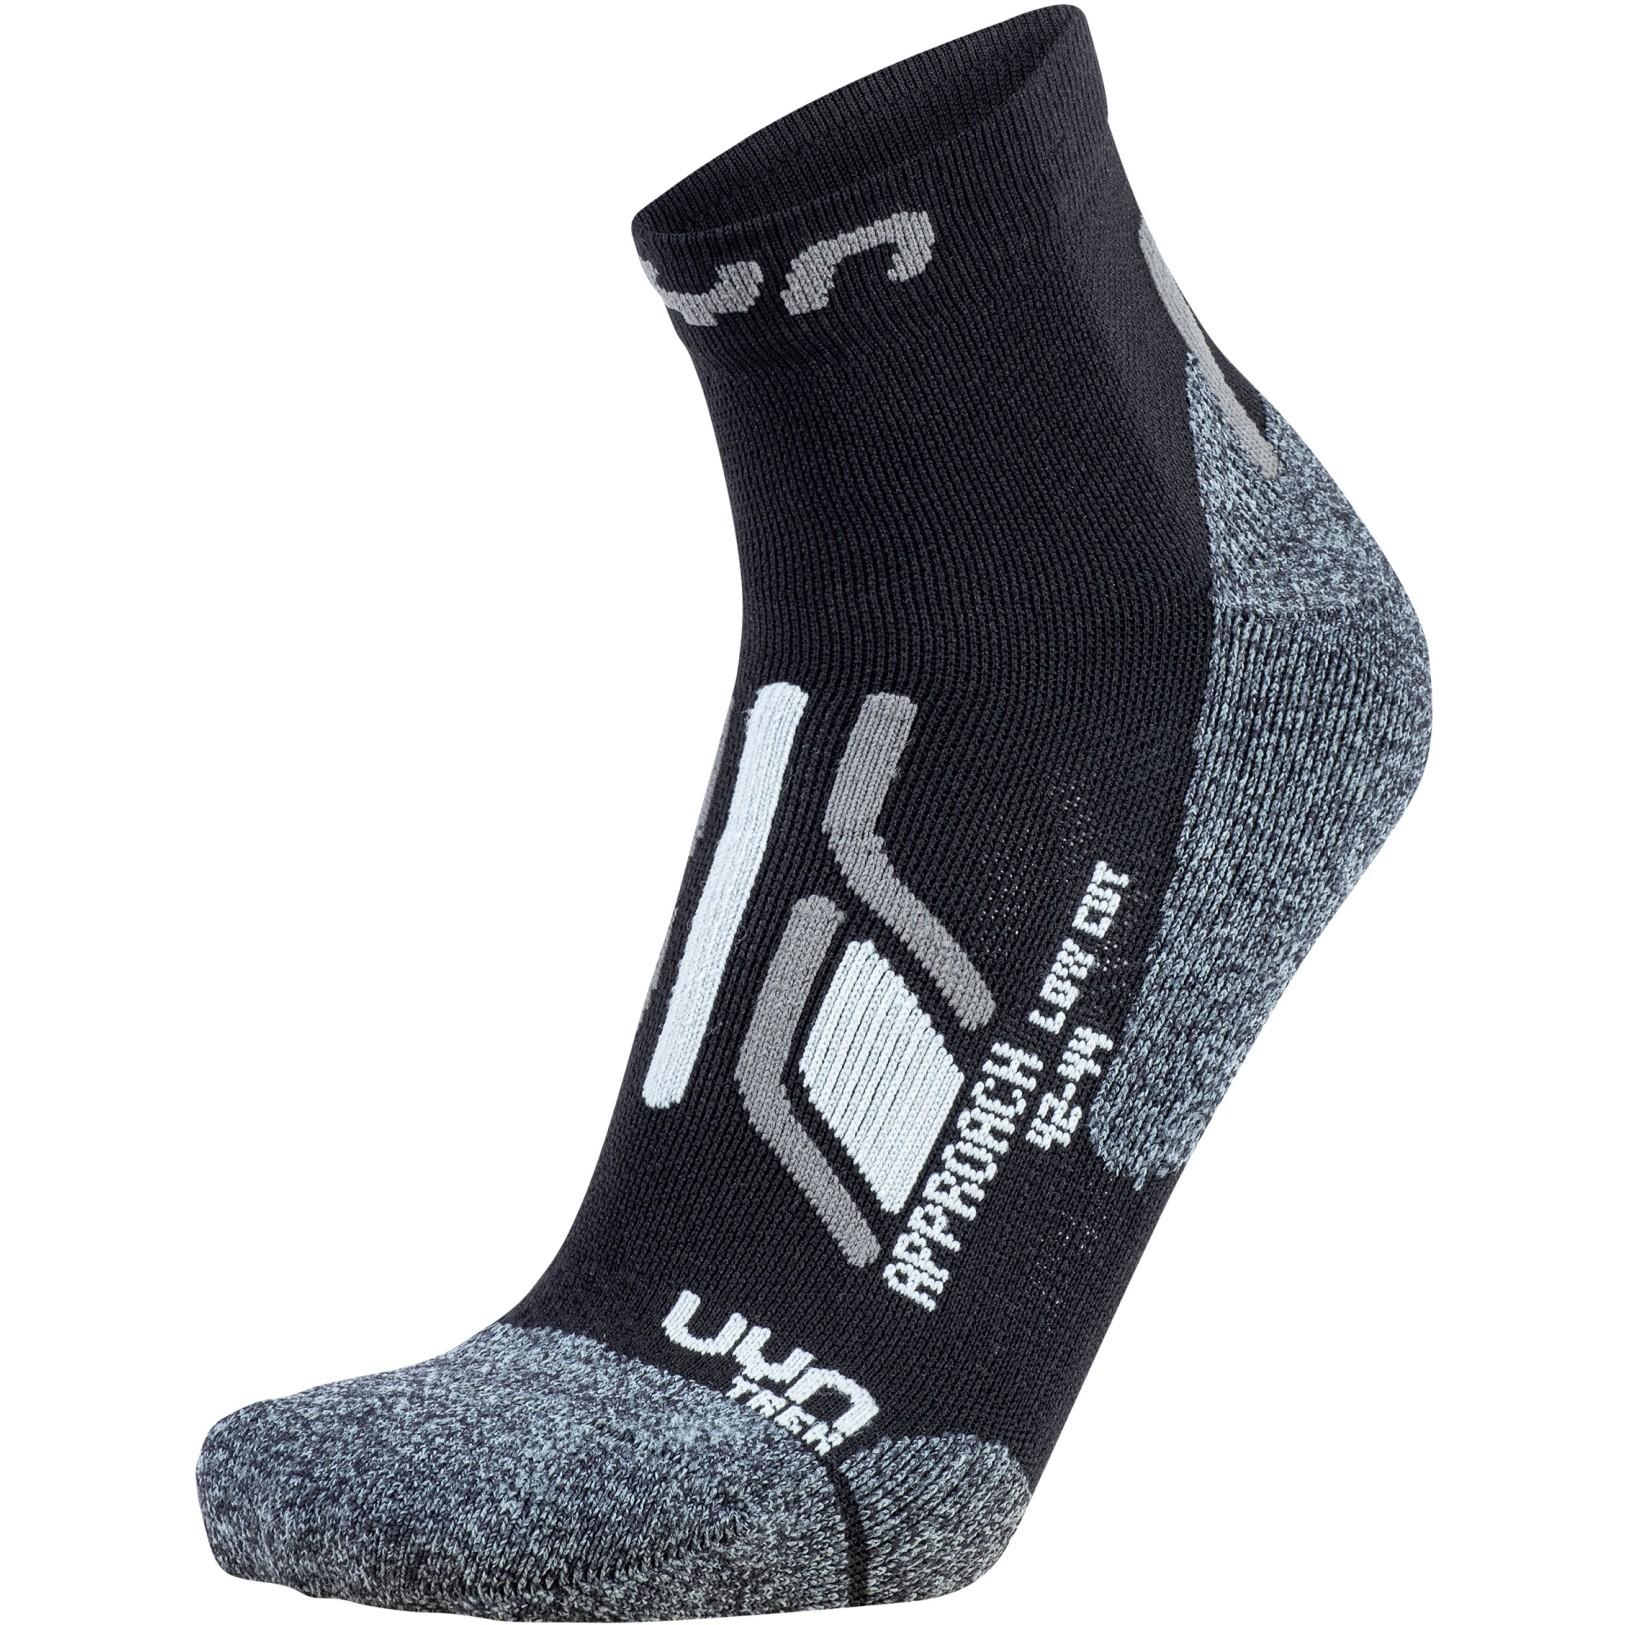 UYN Lady Trekking Approach Low Cut Socks - Black/Grey